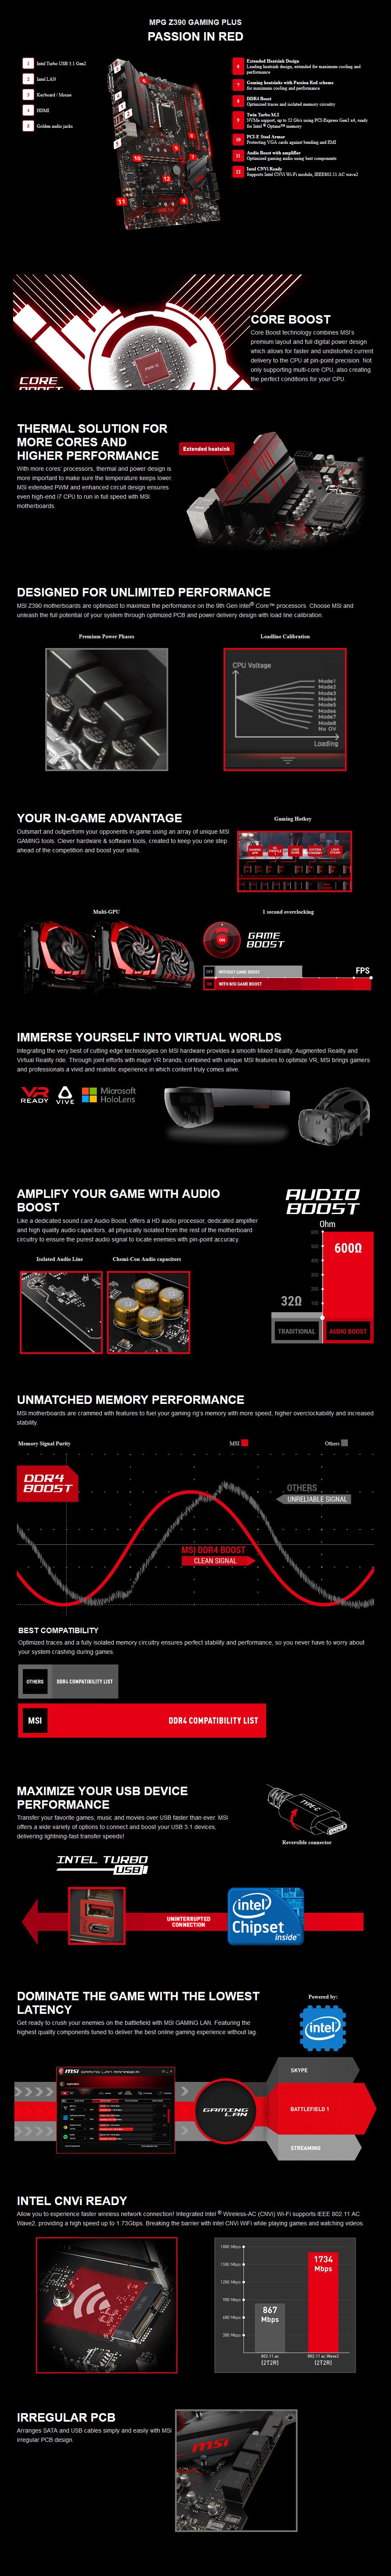 MSI MPG Z390 GAMING PLUS LGA 1151 ATX Motherboard - Desktop Overview 1